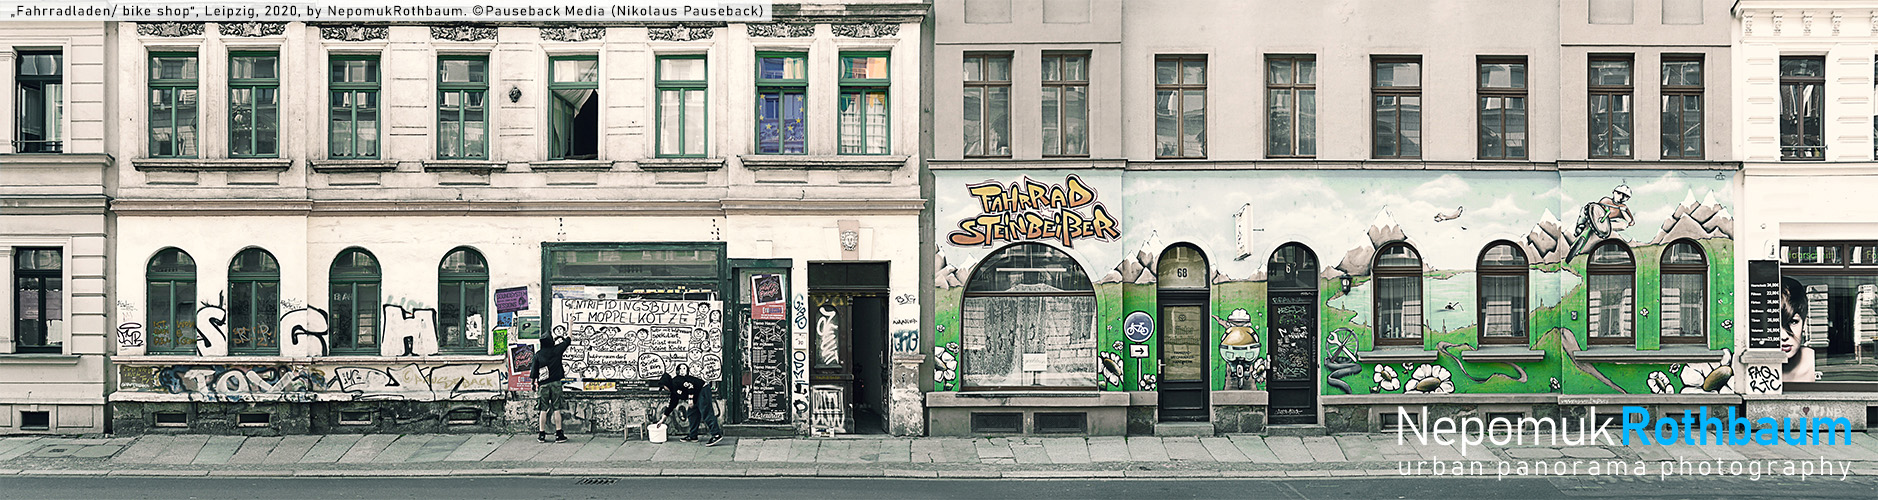 Fahrradladen / bike shop, Leipzig 2020, by Nepomuk Rothbaum, © Pauseback Media 2020